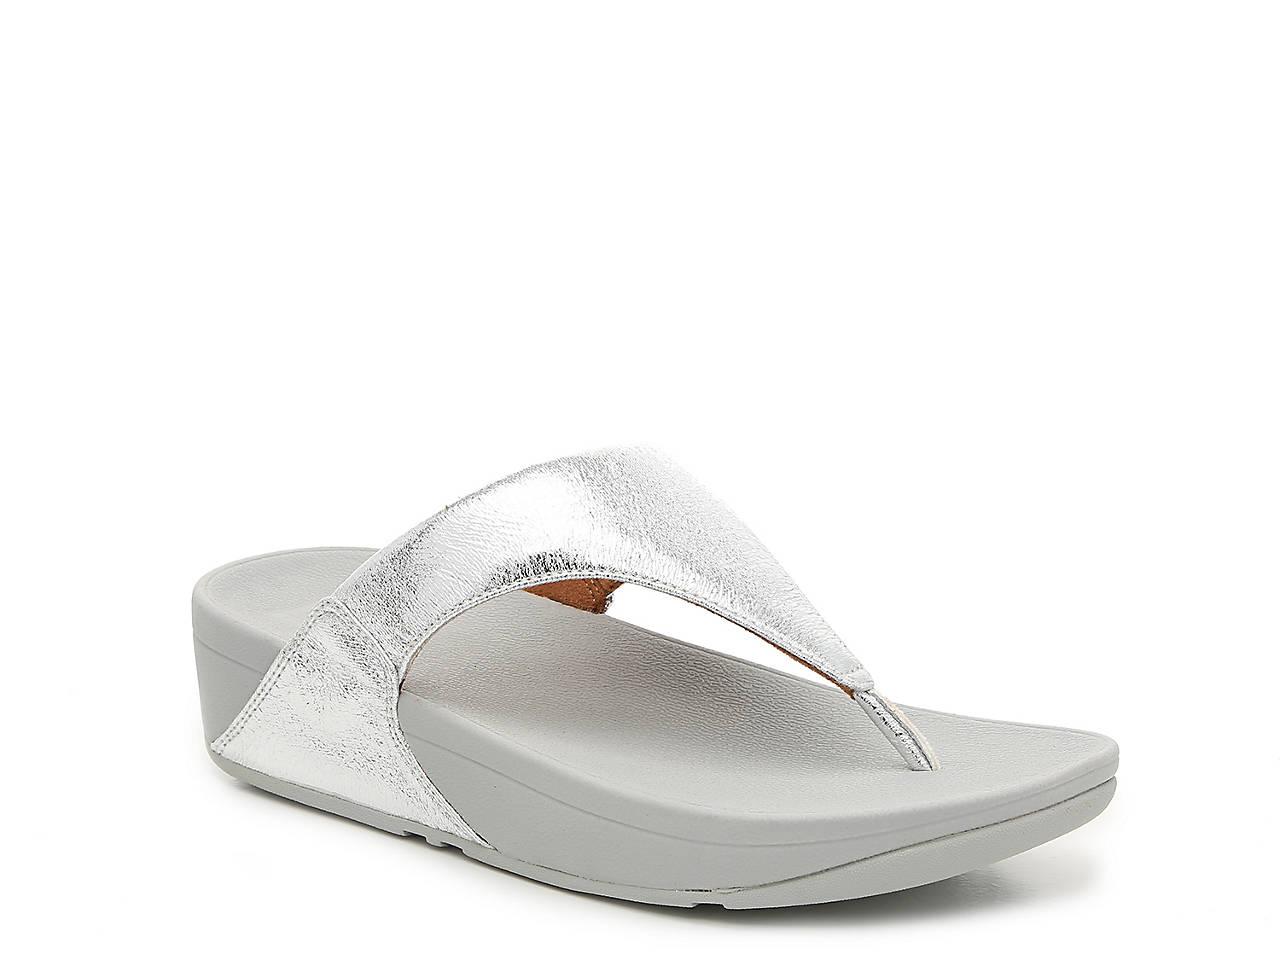 7cb8acce282b FitFlop Lulu Glitzy Wedge Sandal Women s Shoes